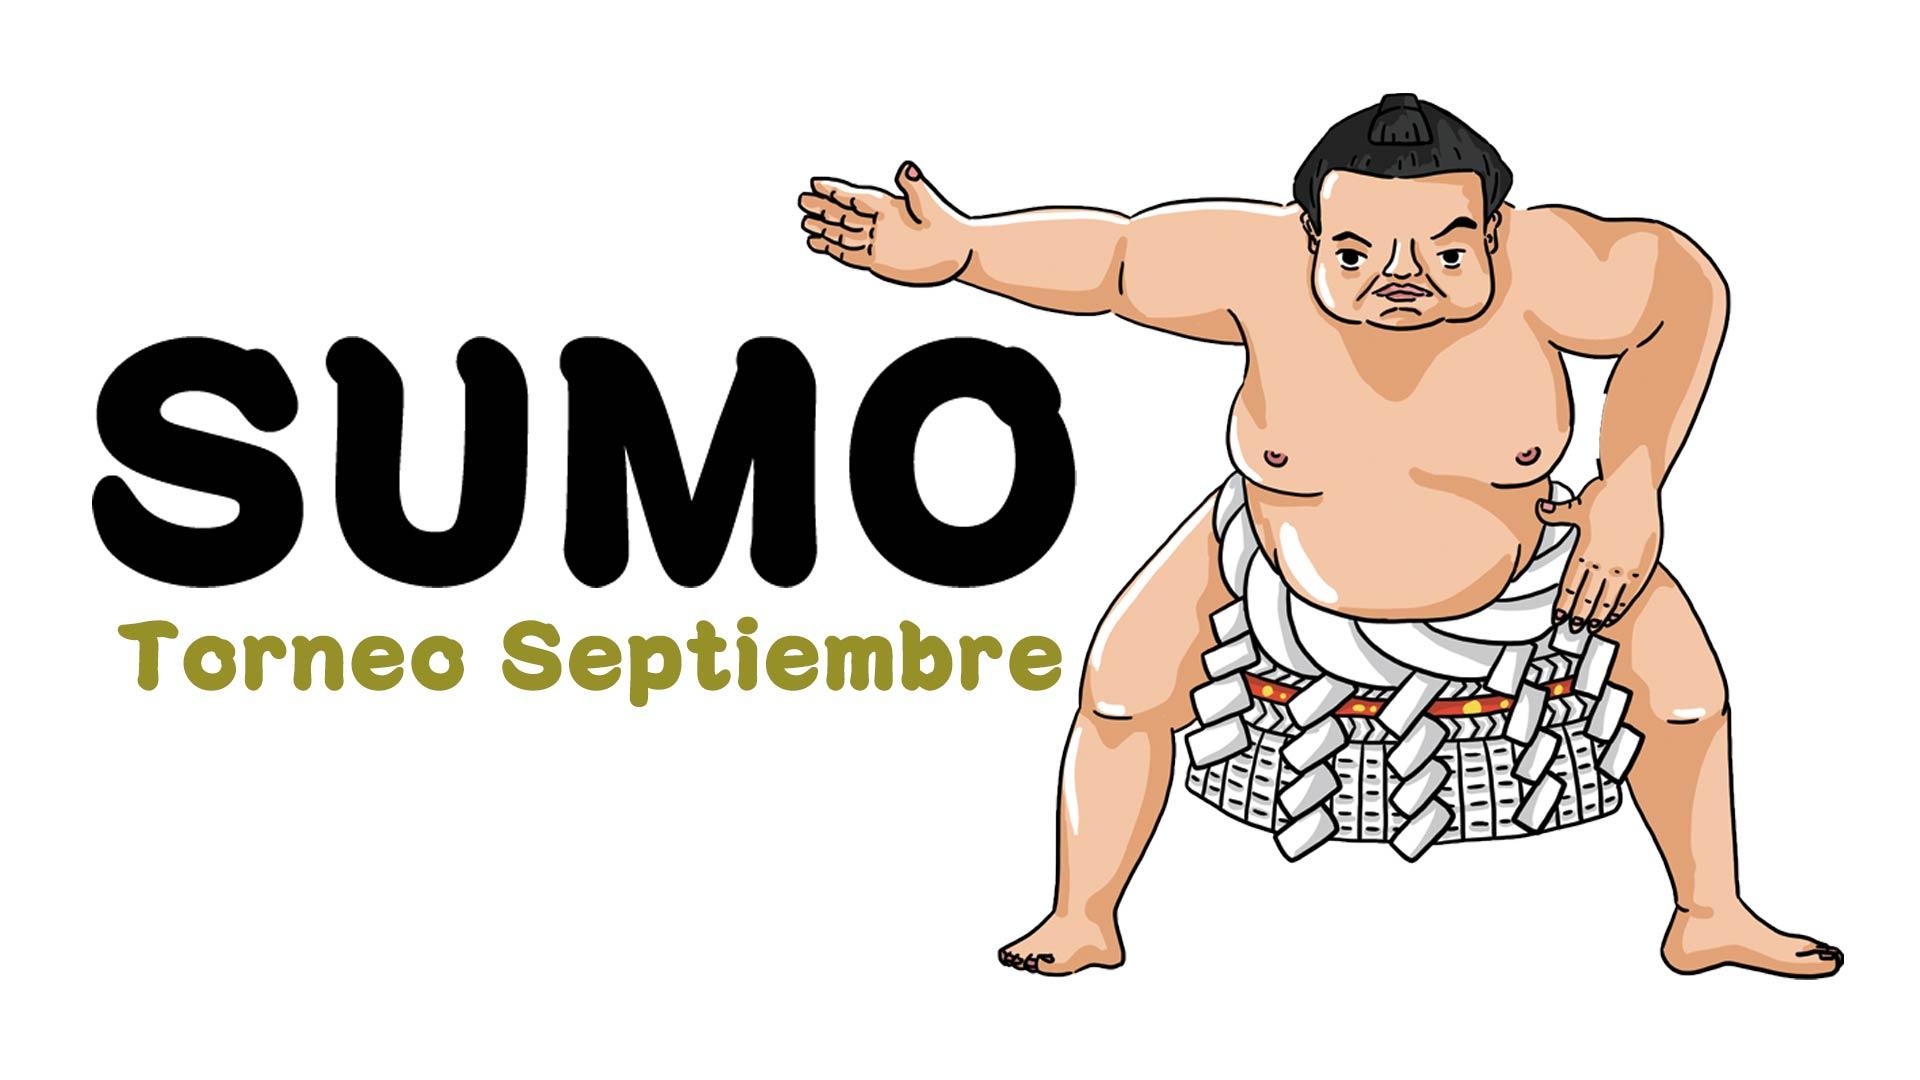 sumo-yokozuna-yohann-postics-zoomES